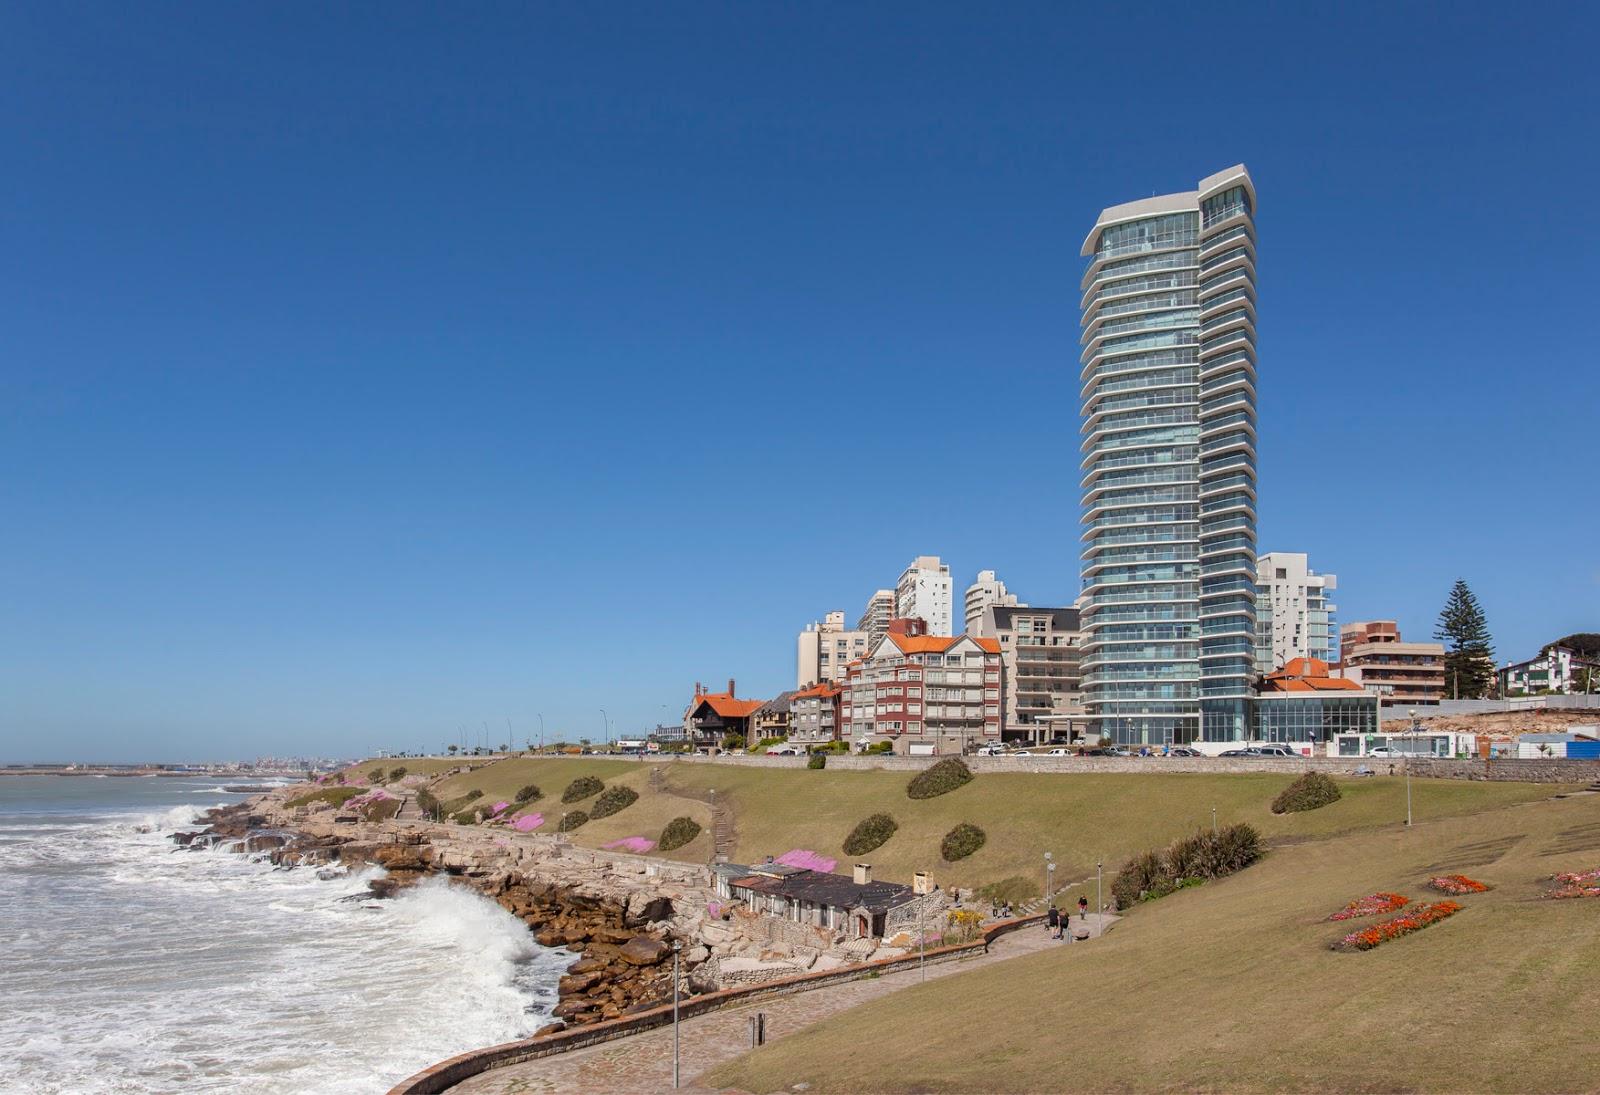 Empresas sapa instala en argentina una moderna c mara de for Carpinterias de aluminio en argentina